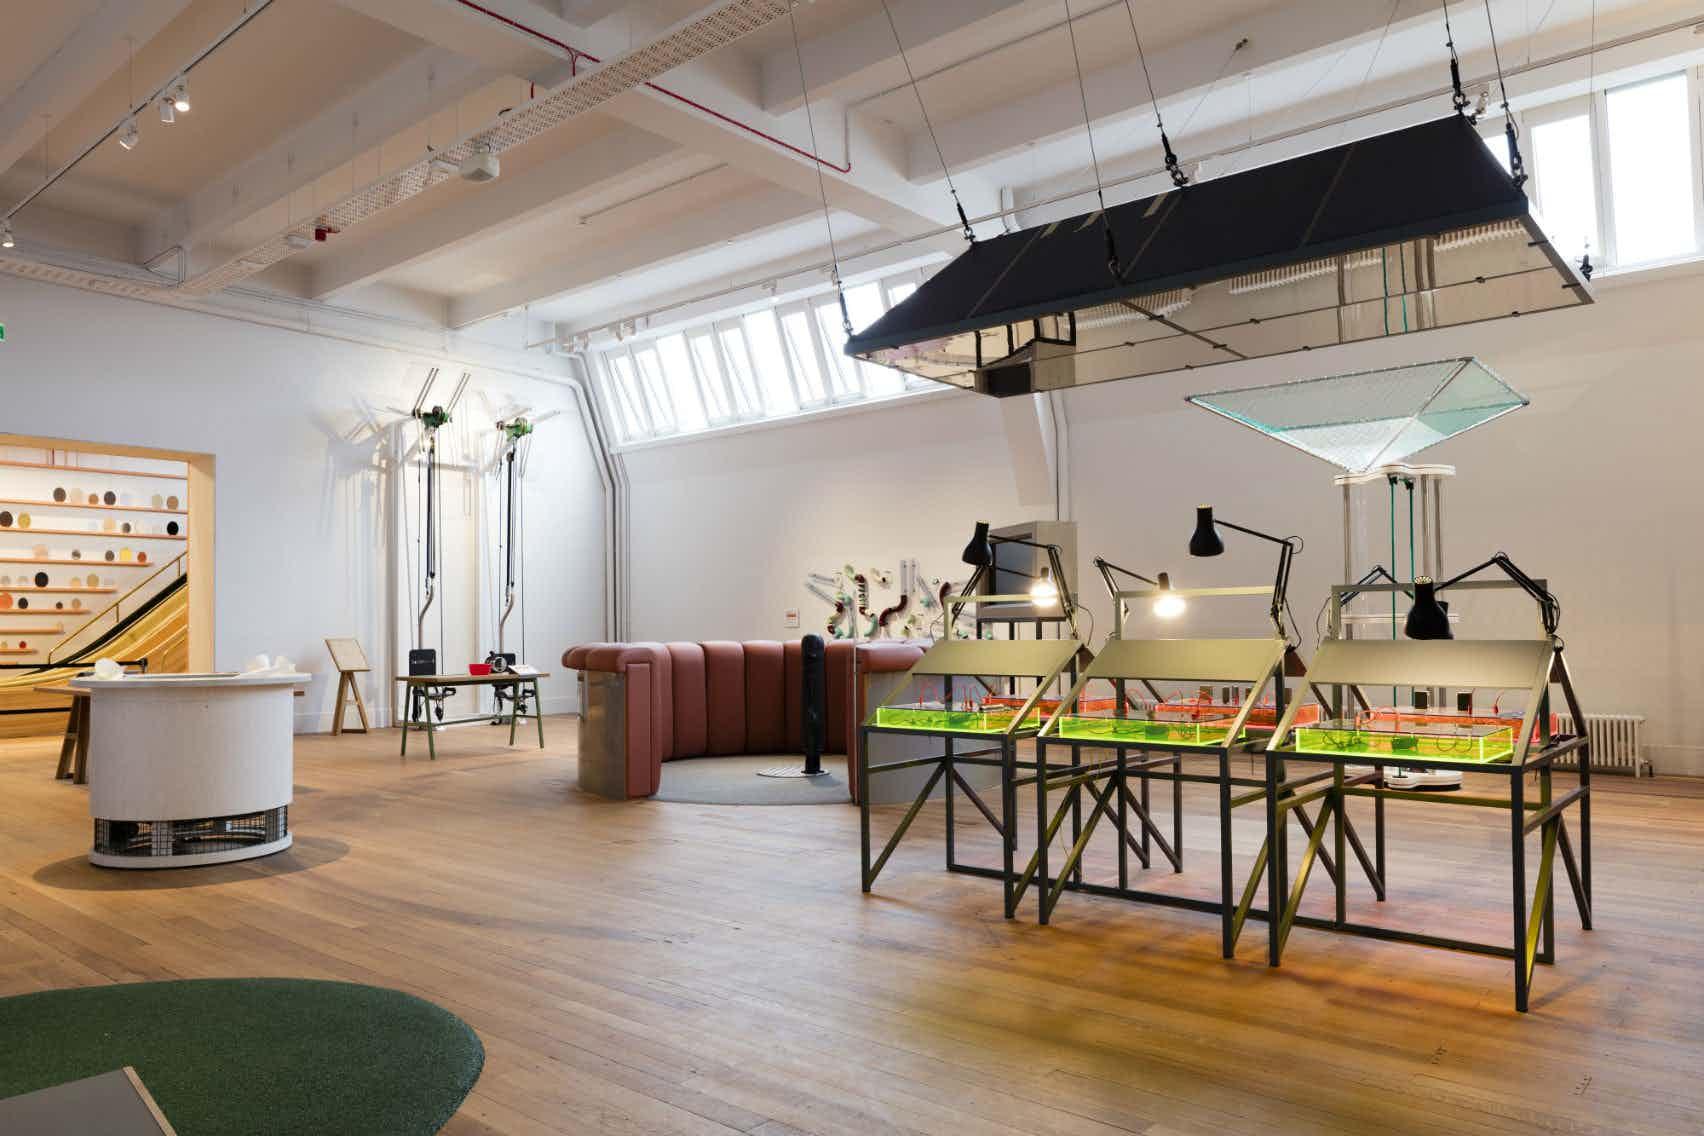 Wonderlab: The Equinor Gallery, Science Museum